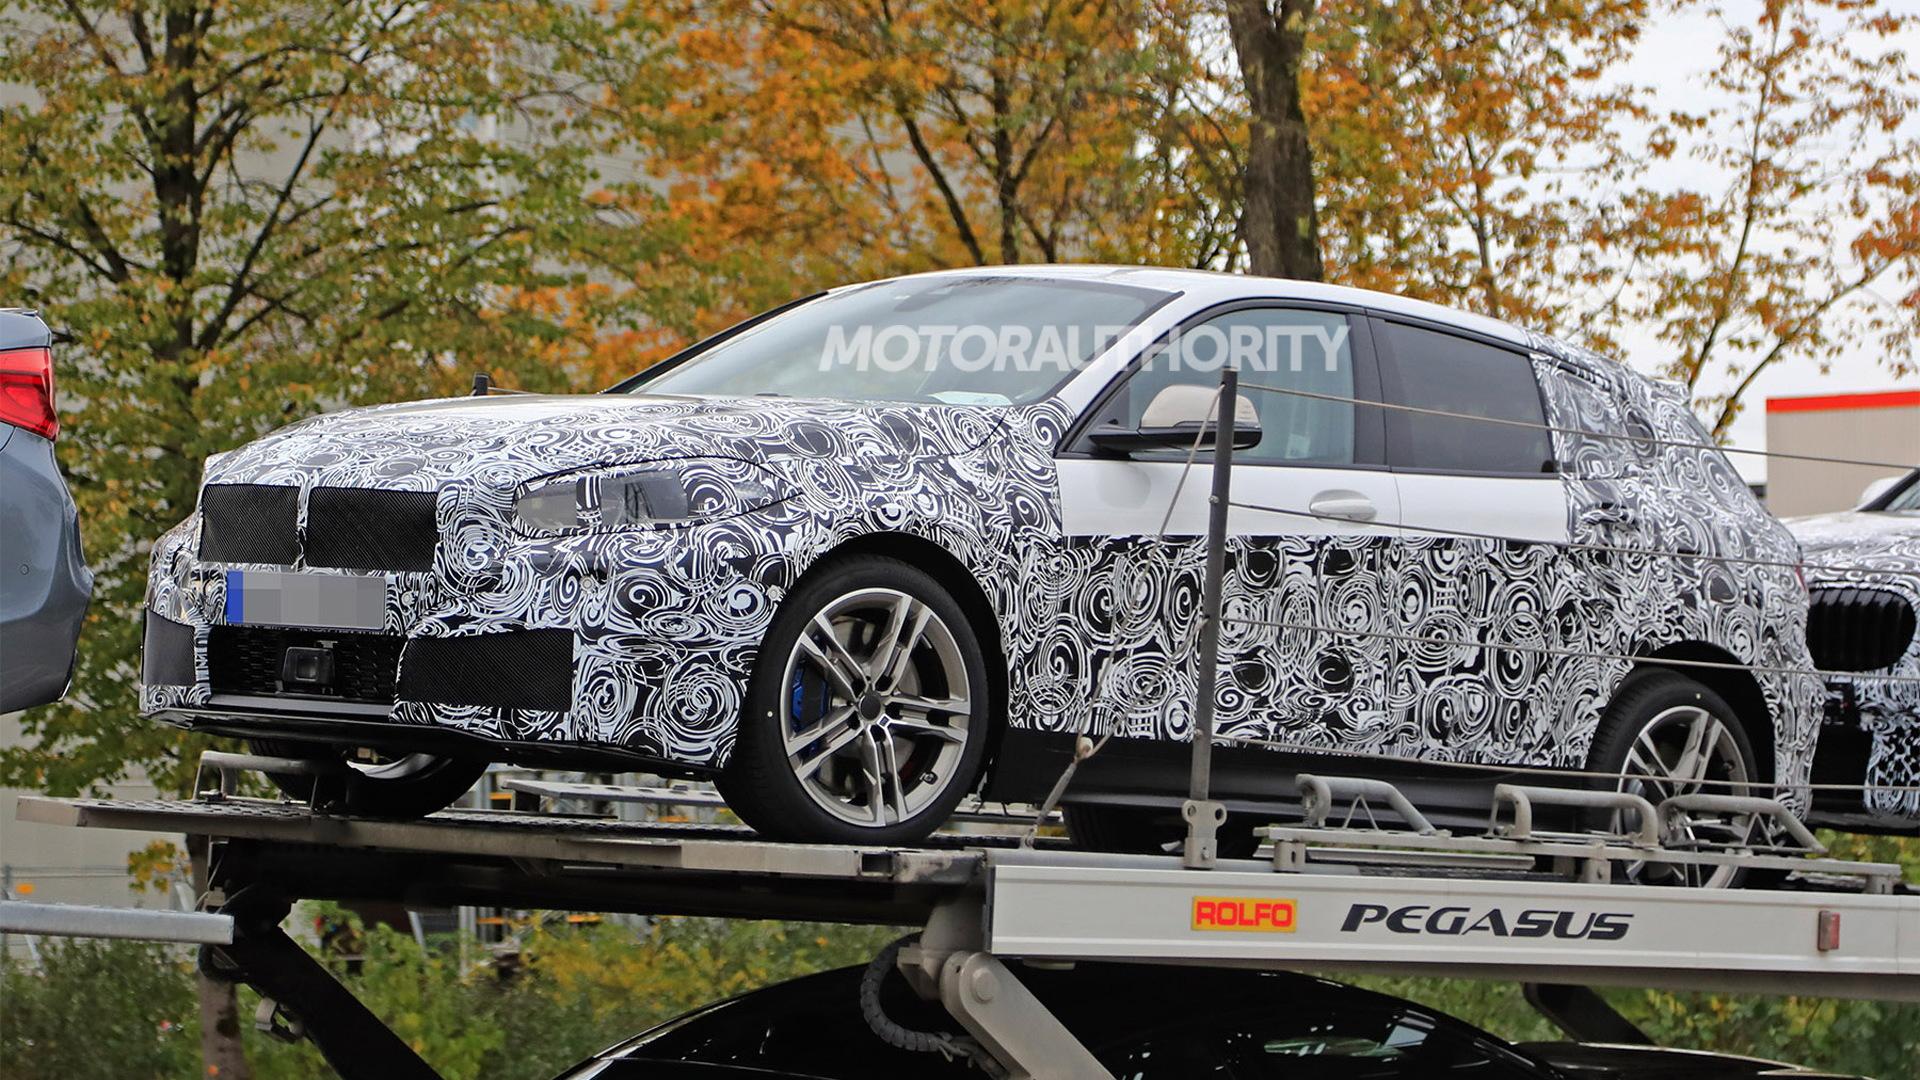 2019 BMW 1-Series Hatchback spy shots - Image via S. Baldauf/SB-Medien